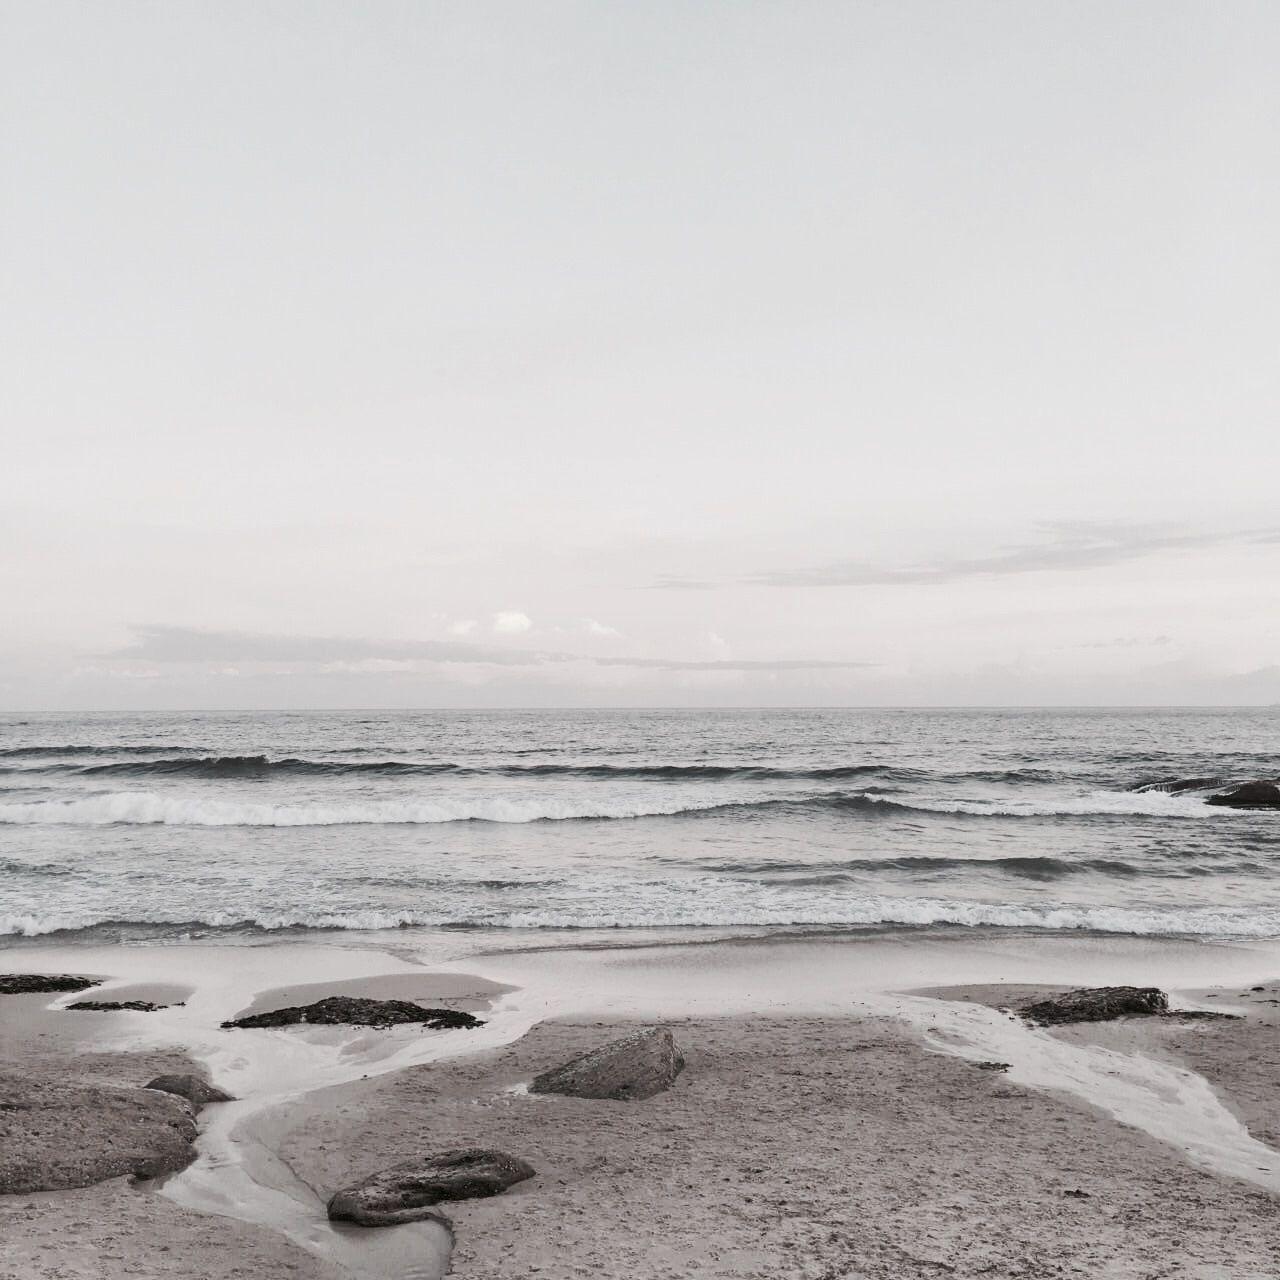 Tumblr Beachy Aesthetic Girly Beach Vibes Instagram Paris Woods Pinterest Pariswoods7 Beach Aesthetic Beachy Aesthetic Beach Girly beach vibes girly cute vintage